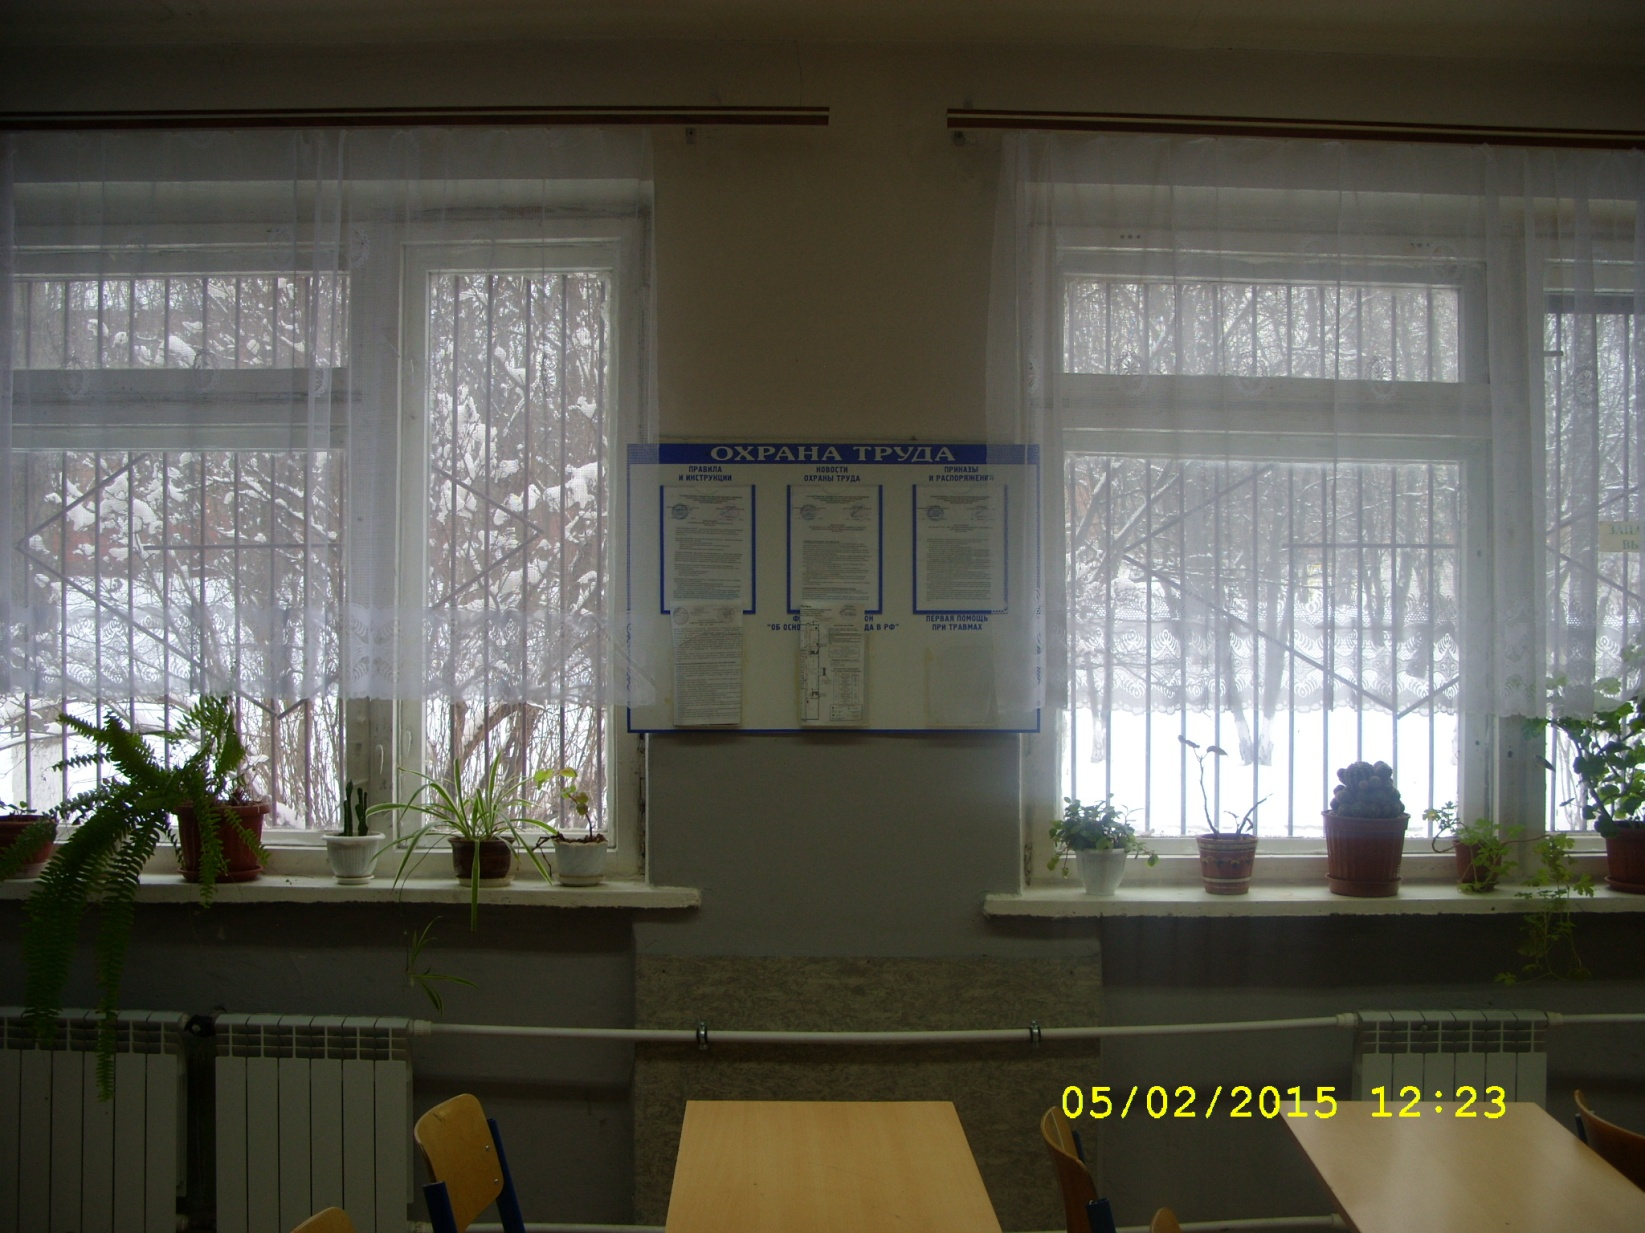 C:\Users\Зинаида\Desktop\Мои последние фото\SS852403.JPG